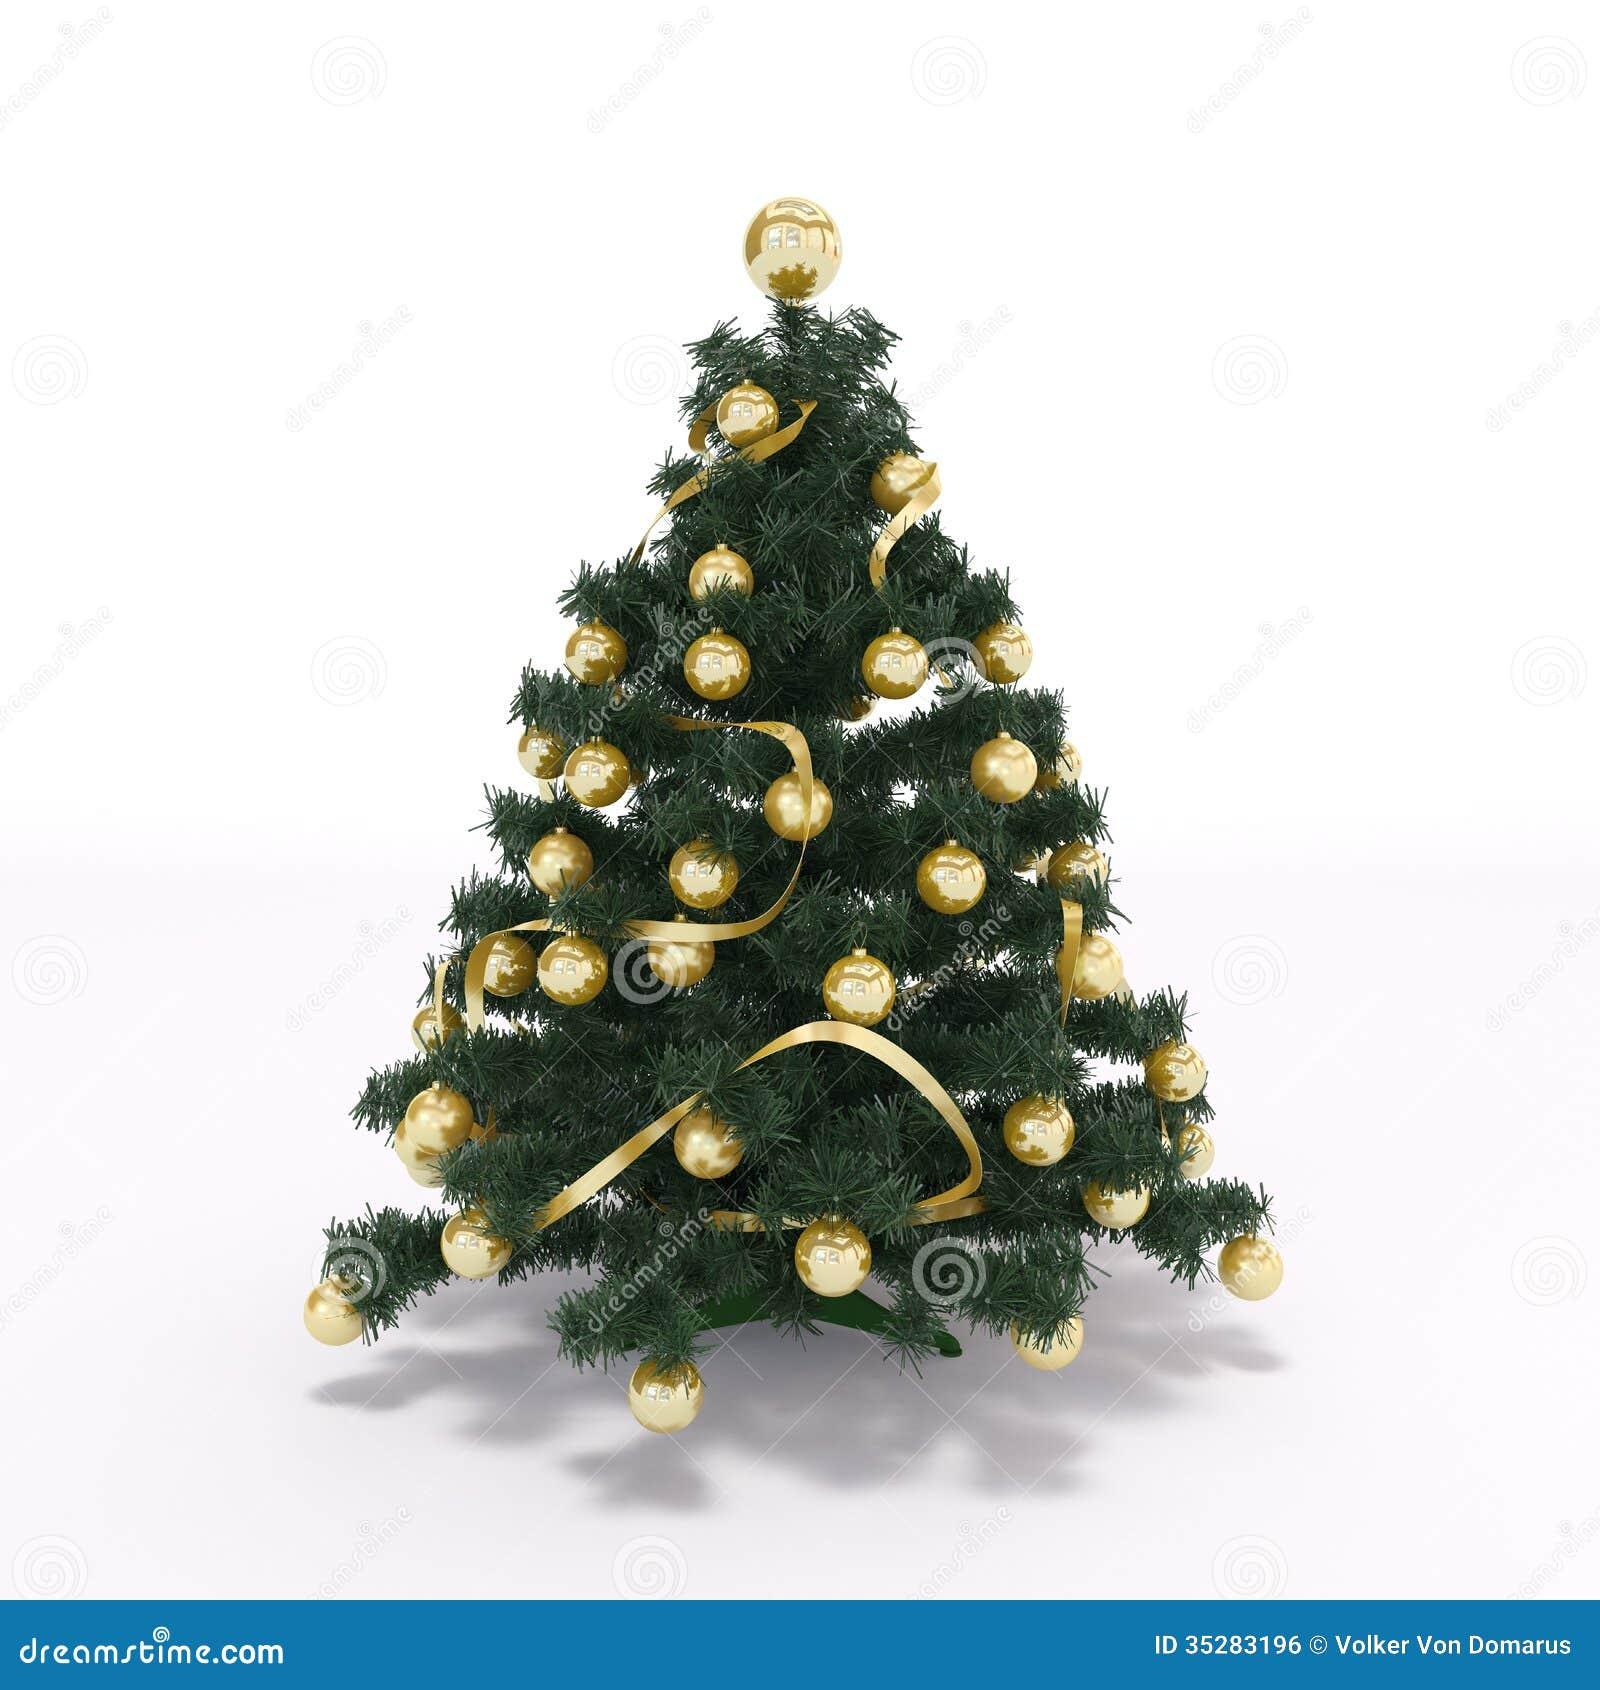 Xmas tree royalty free stock image image 35283196 for Decoration 3d free